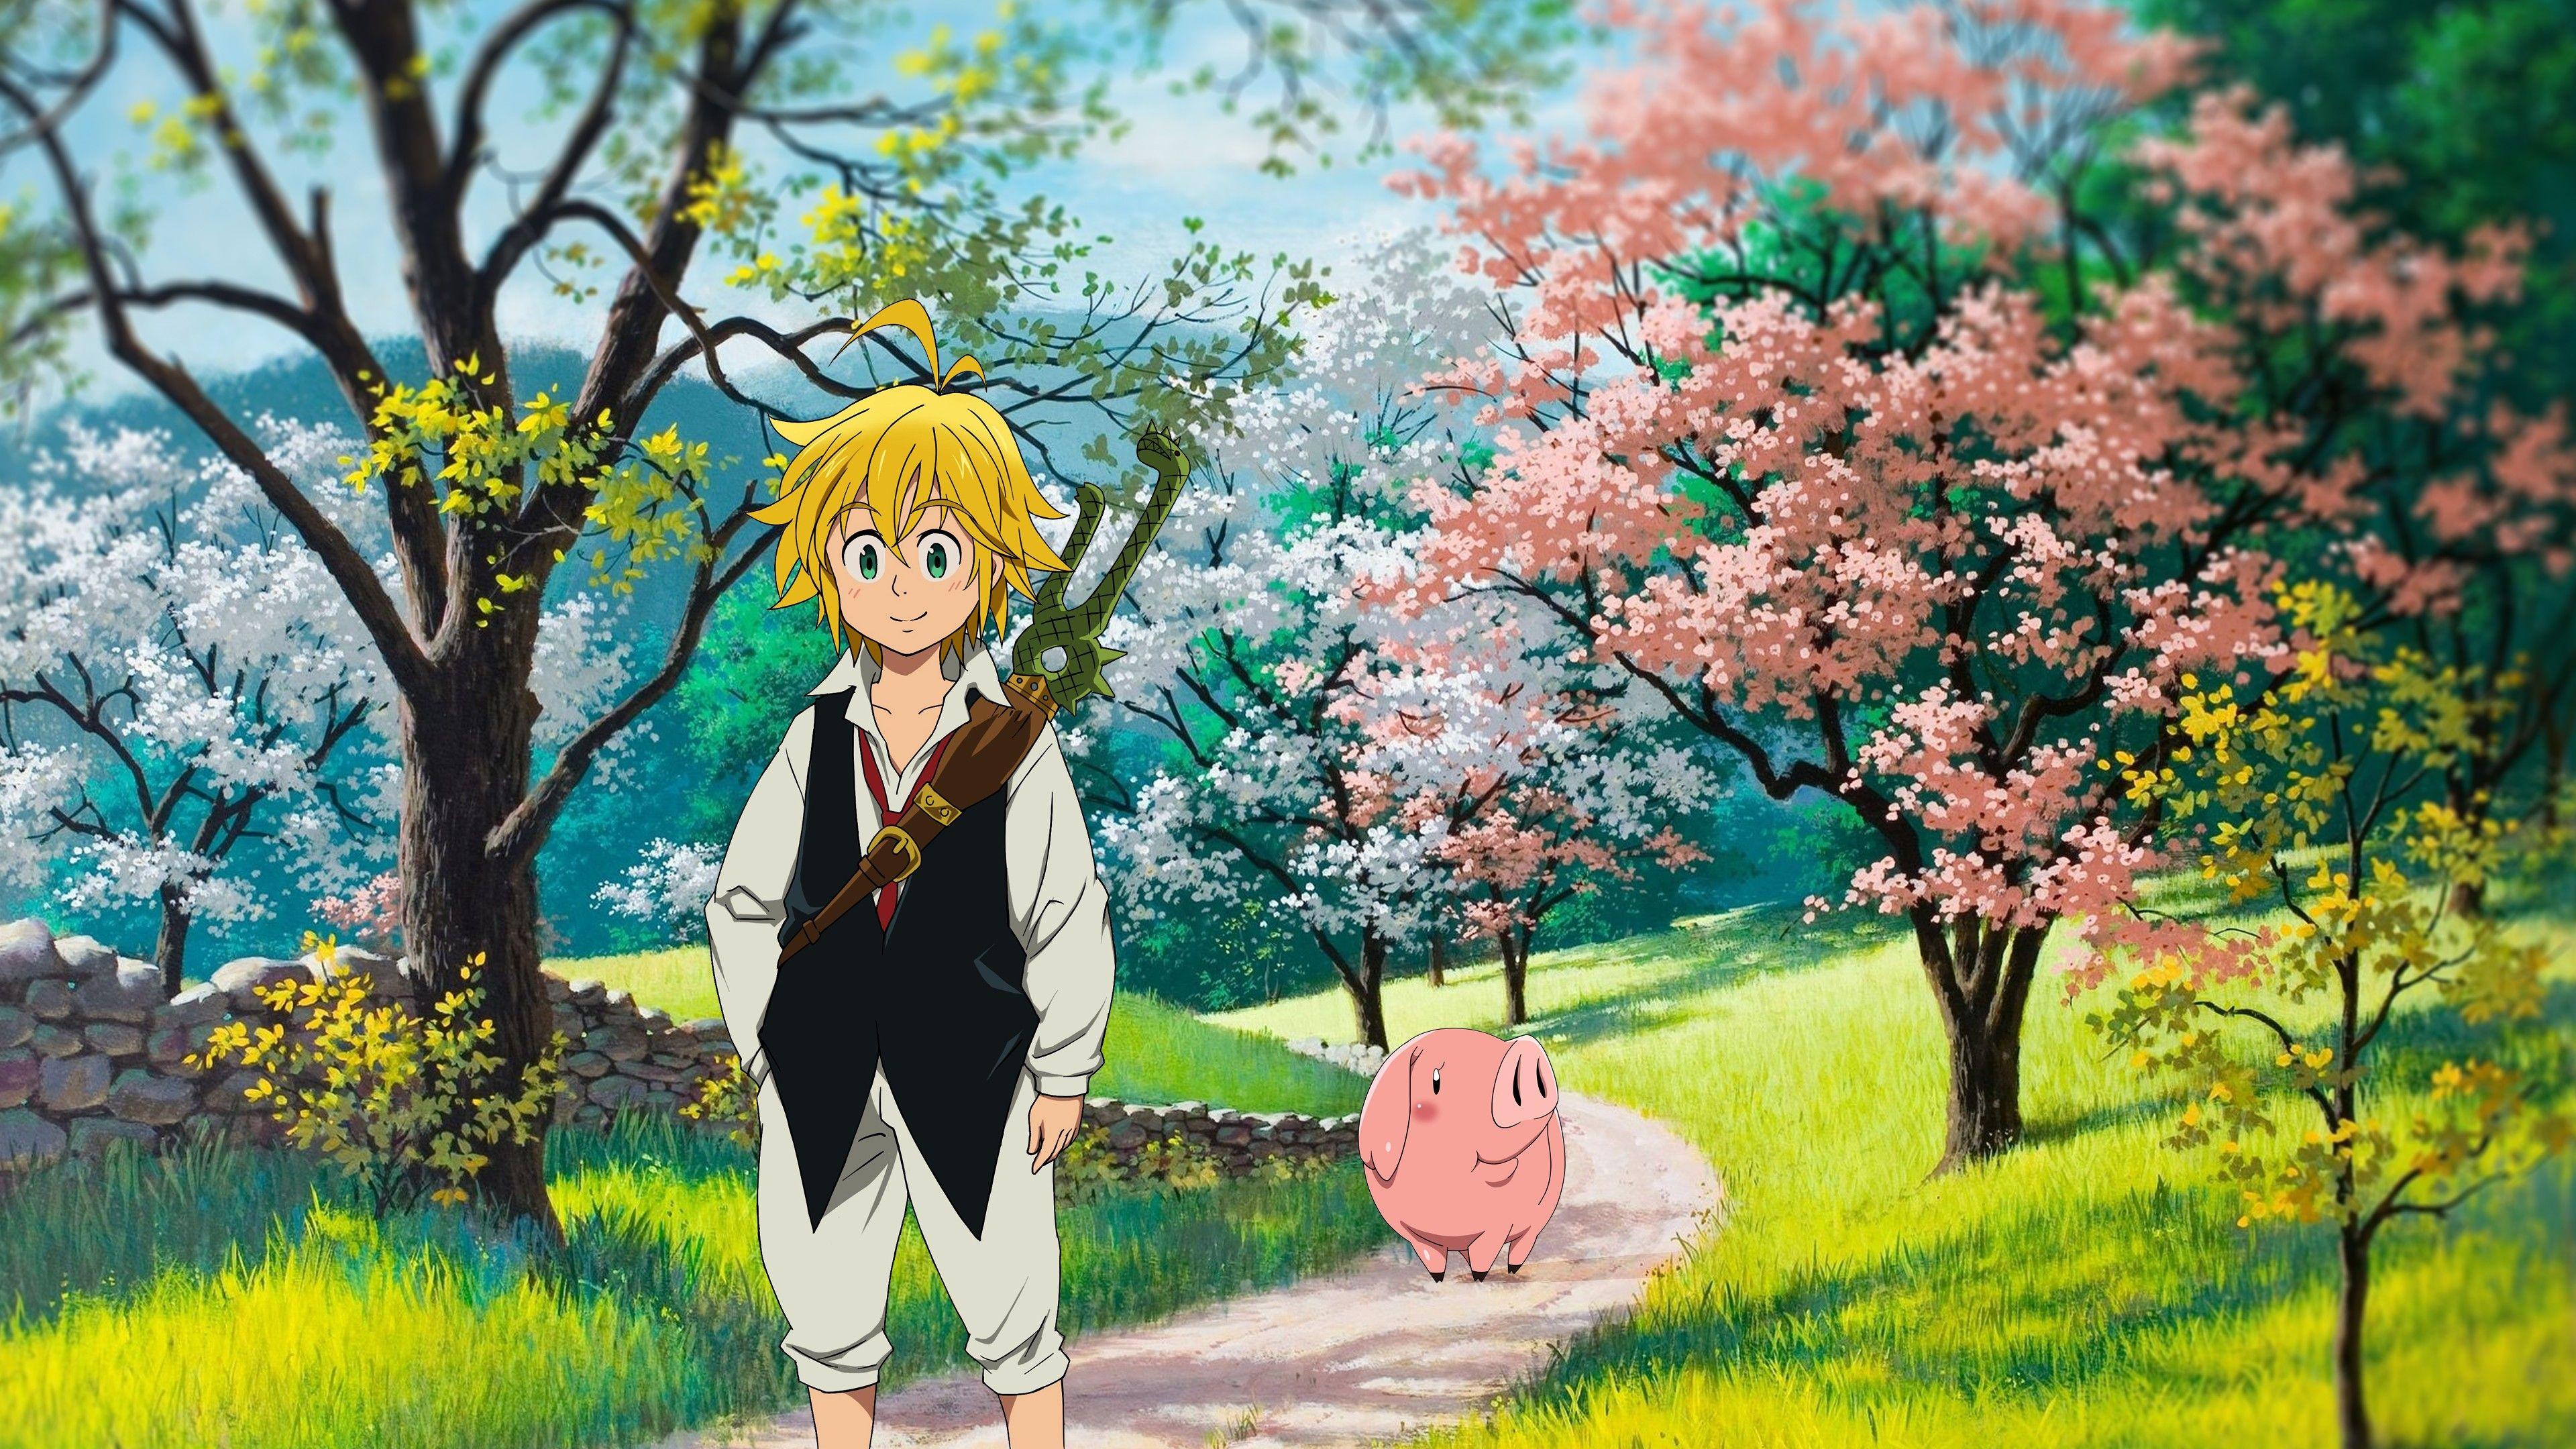 Nanatsu No Taizai 4k Pig Wallpapers Hd Wallpapers Digital Art Wallpapers Artwork Wallpapers Artist Wa In 2020 Anime Wallpaper Seven Deadly Sins Anime Art Wallpaper